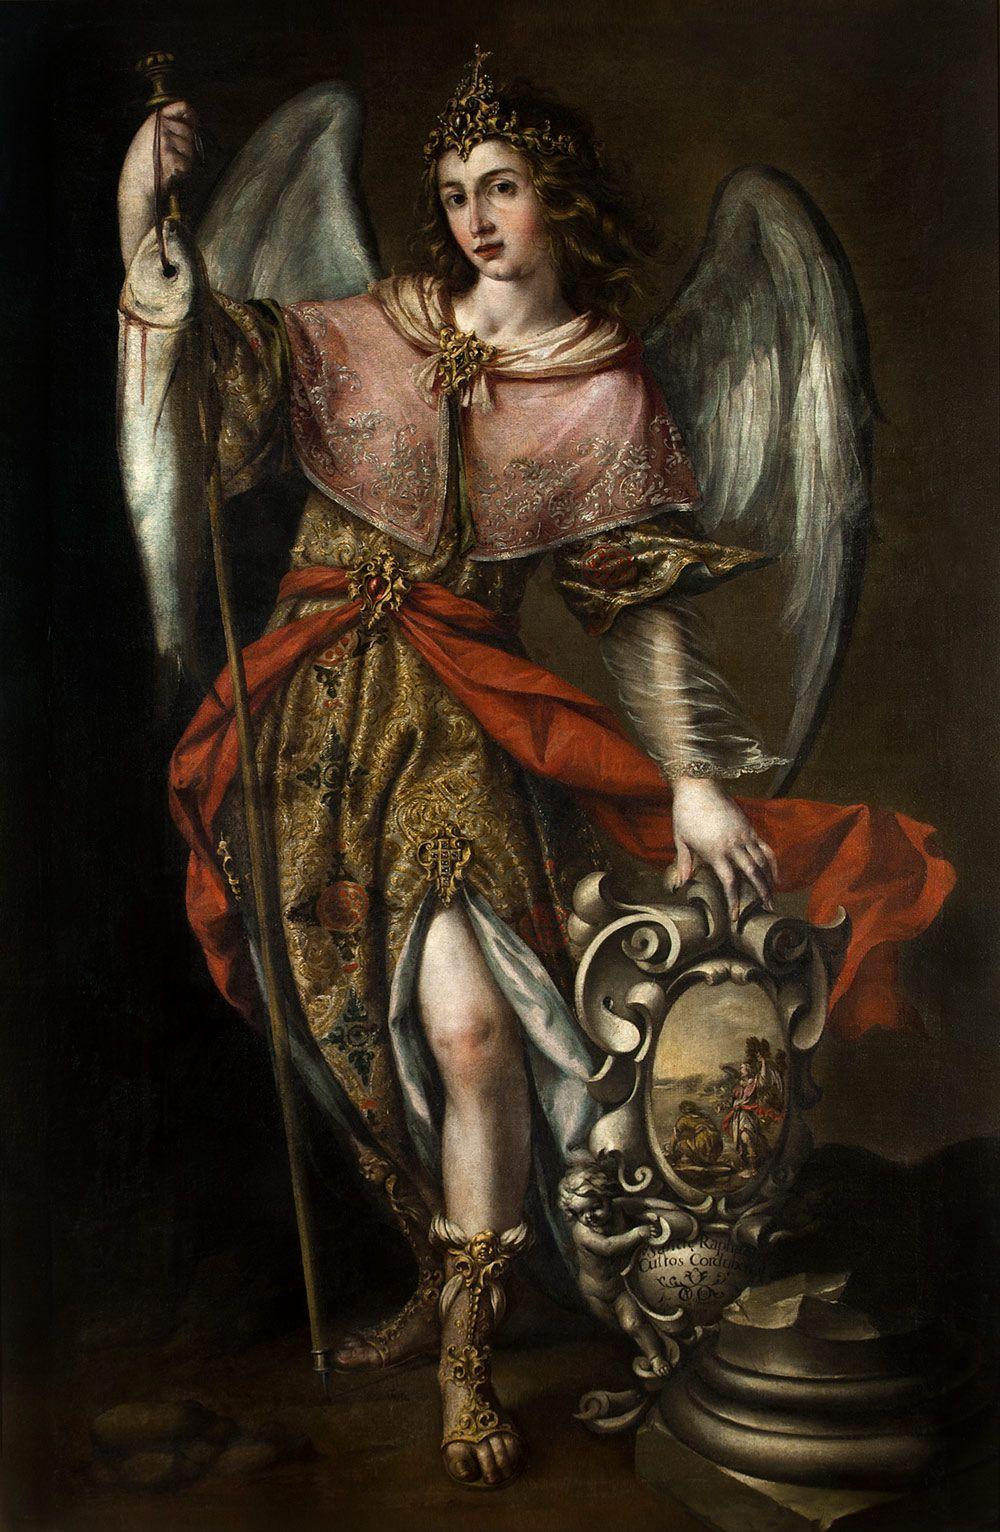 Arcangel Follando saint raphael the archangel forms a pair with saint michael